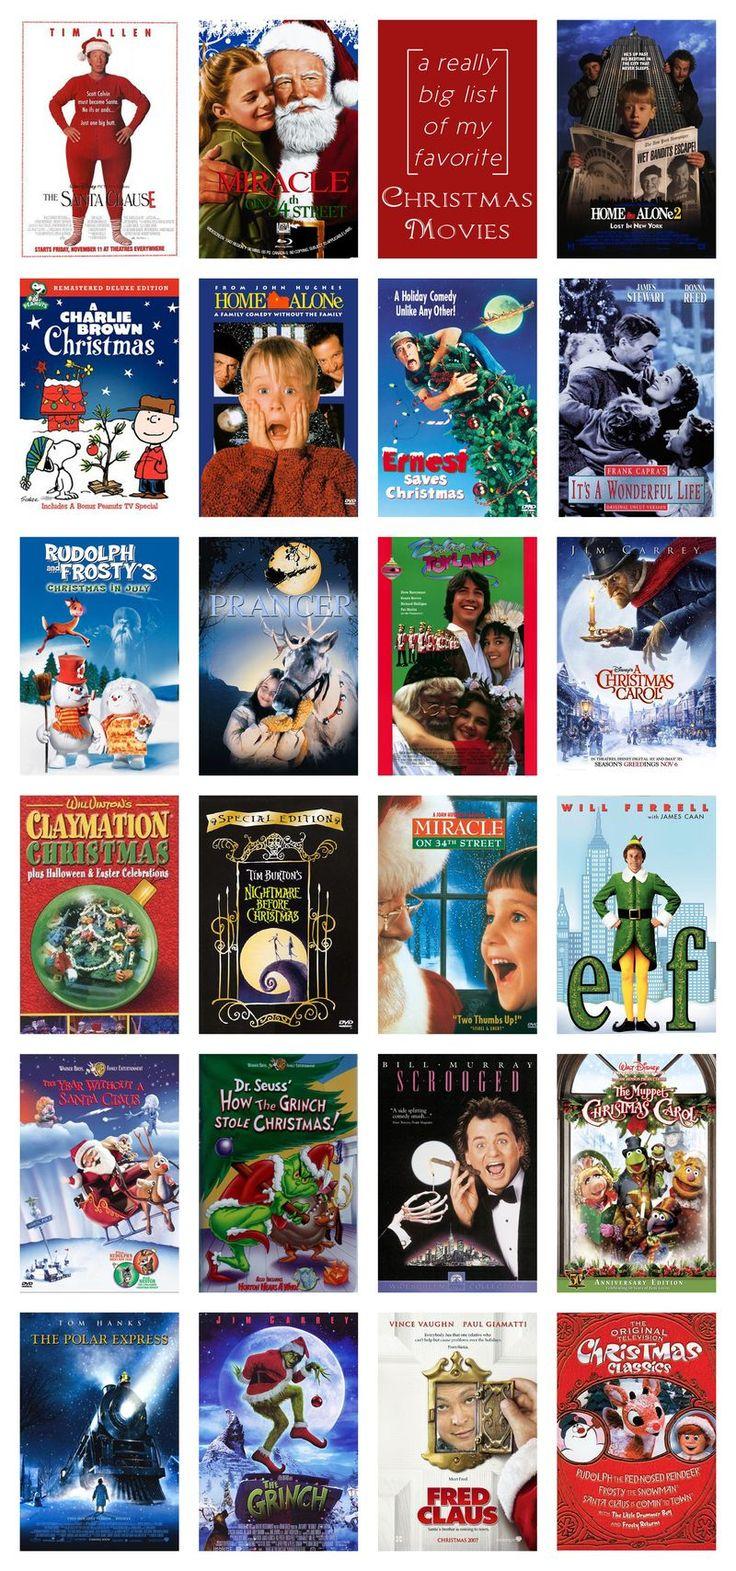 A really big list of my favorite Christmas movies via complicated simplicity